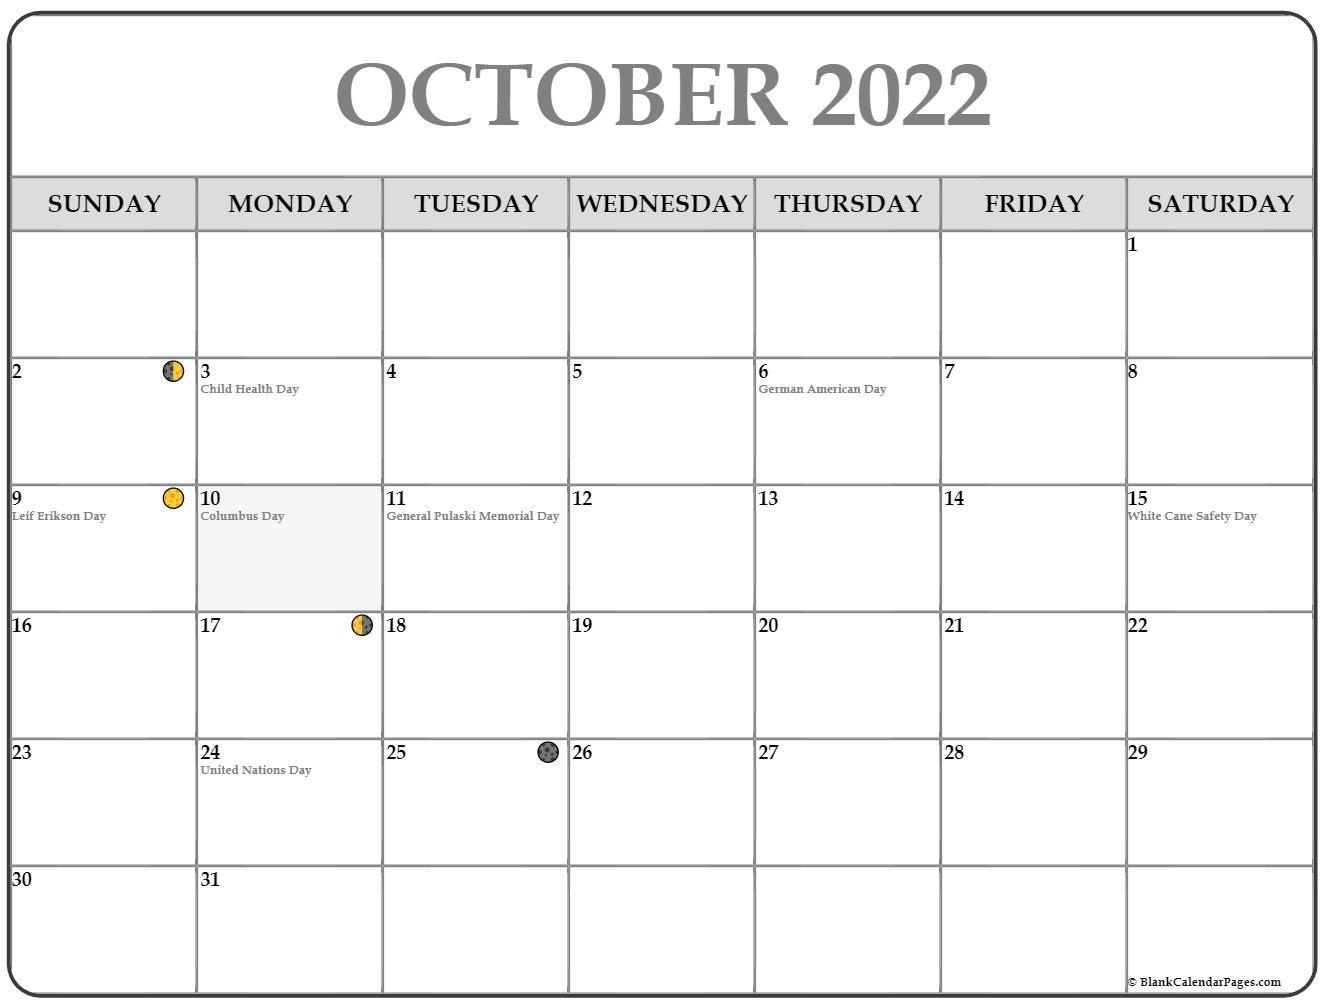 October 2022 Lunar Calendar | Moon Phase Calendar